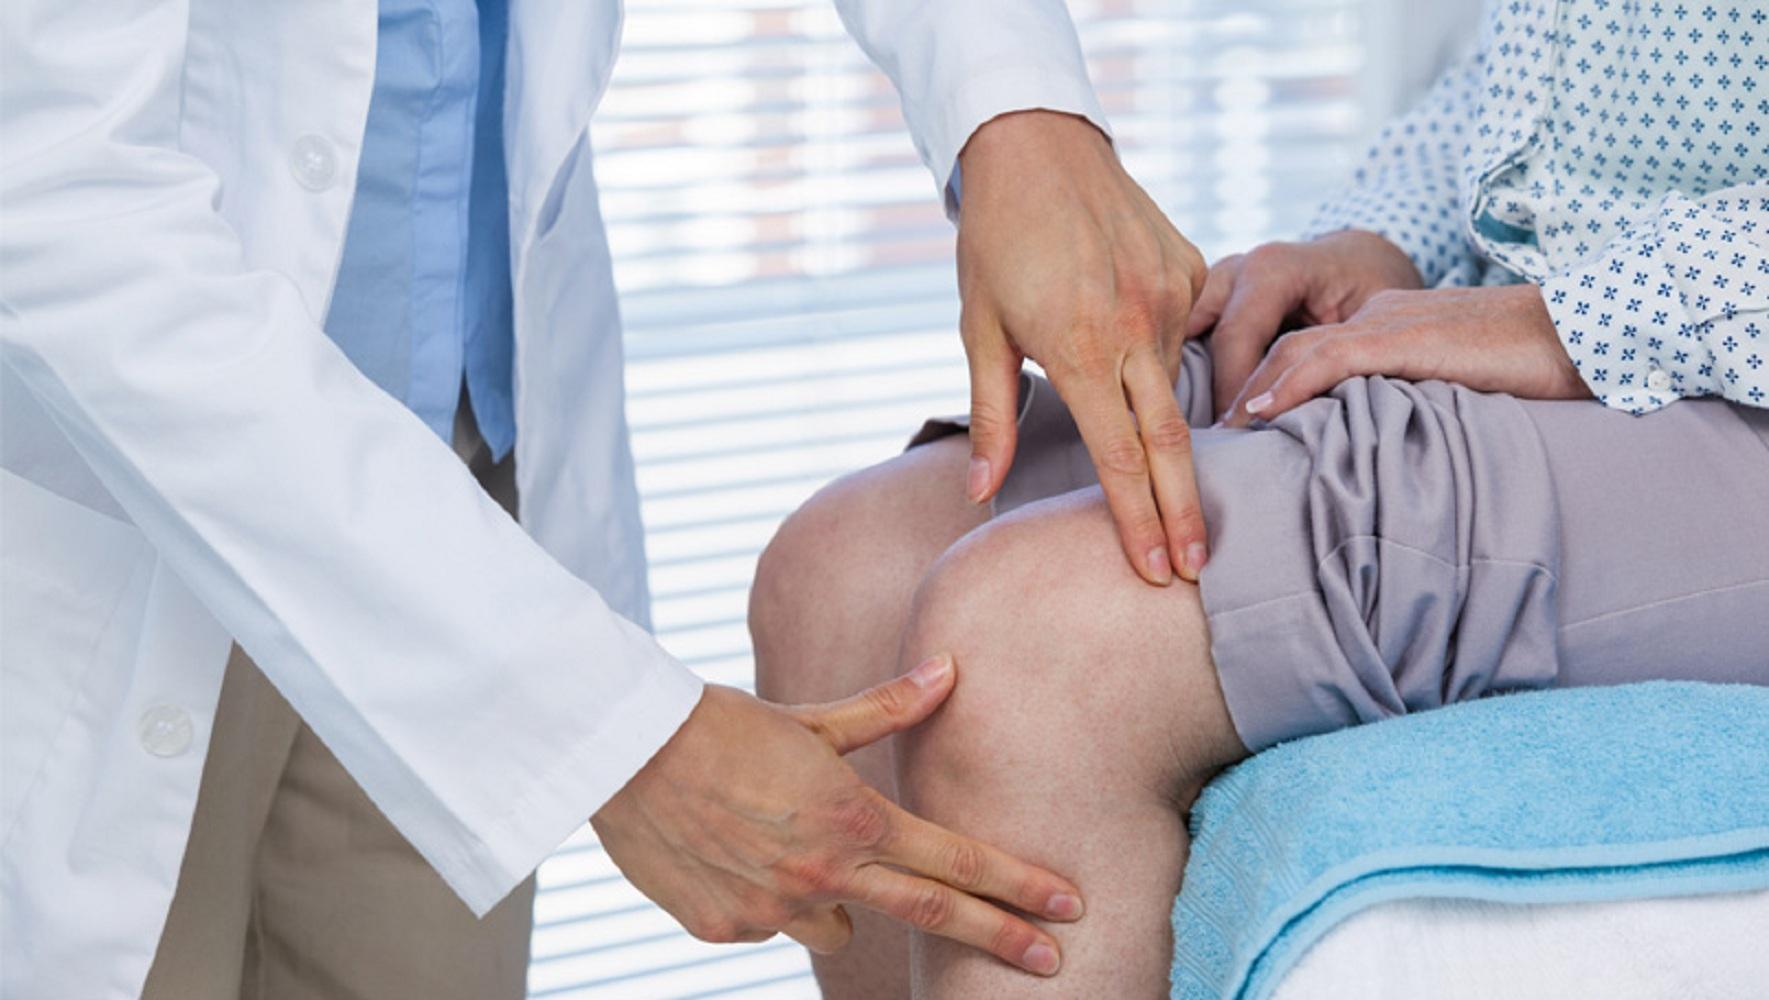 tratament intraarticular al genunchiului de șoarece raport asupra leziunilor la genunchi